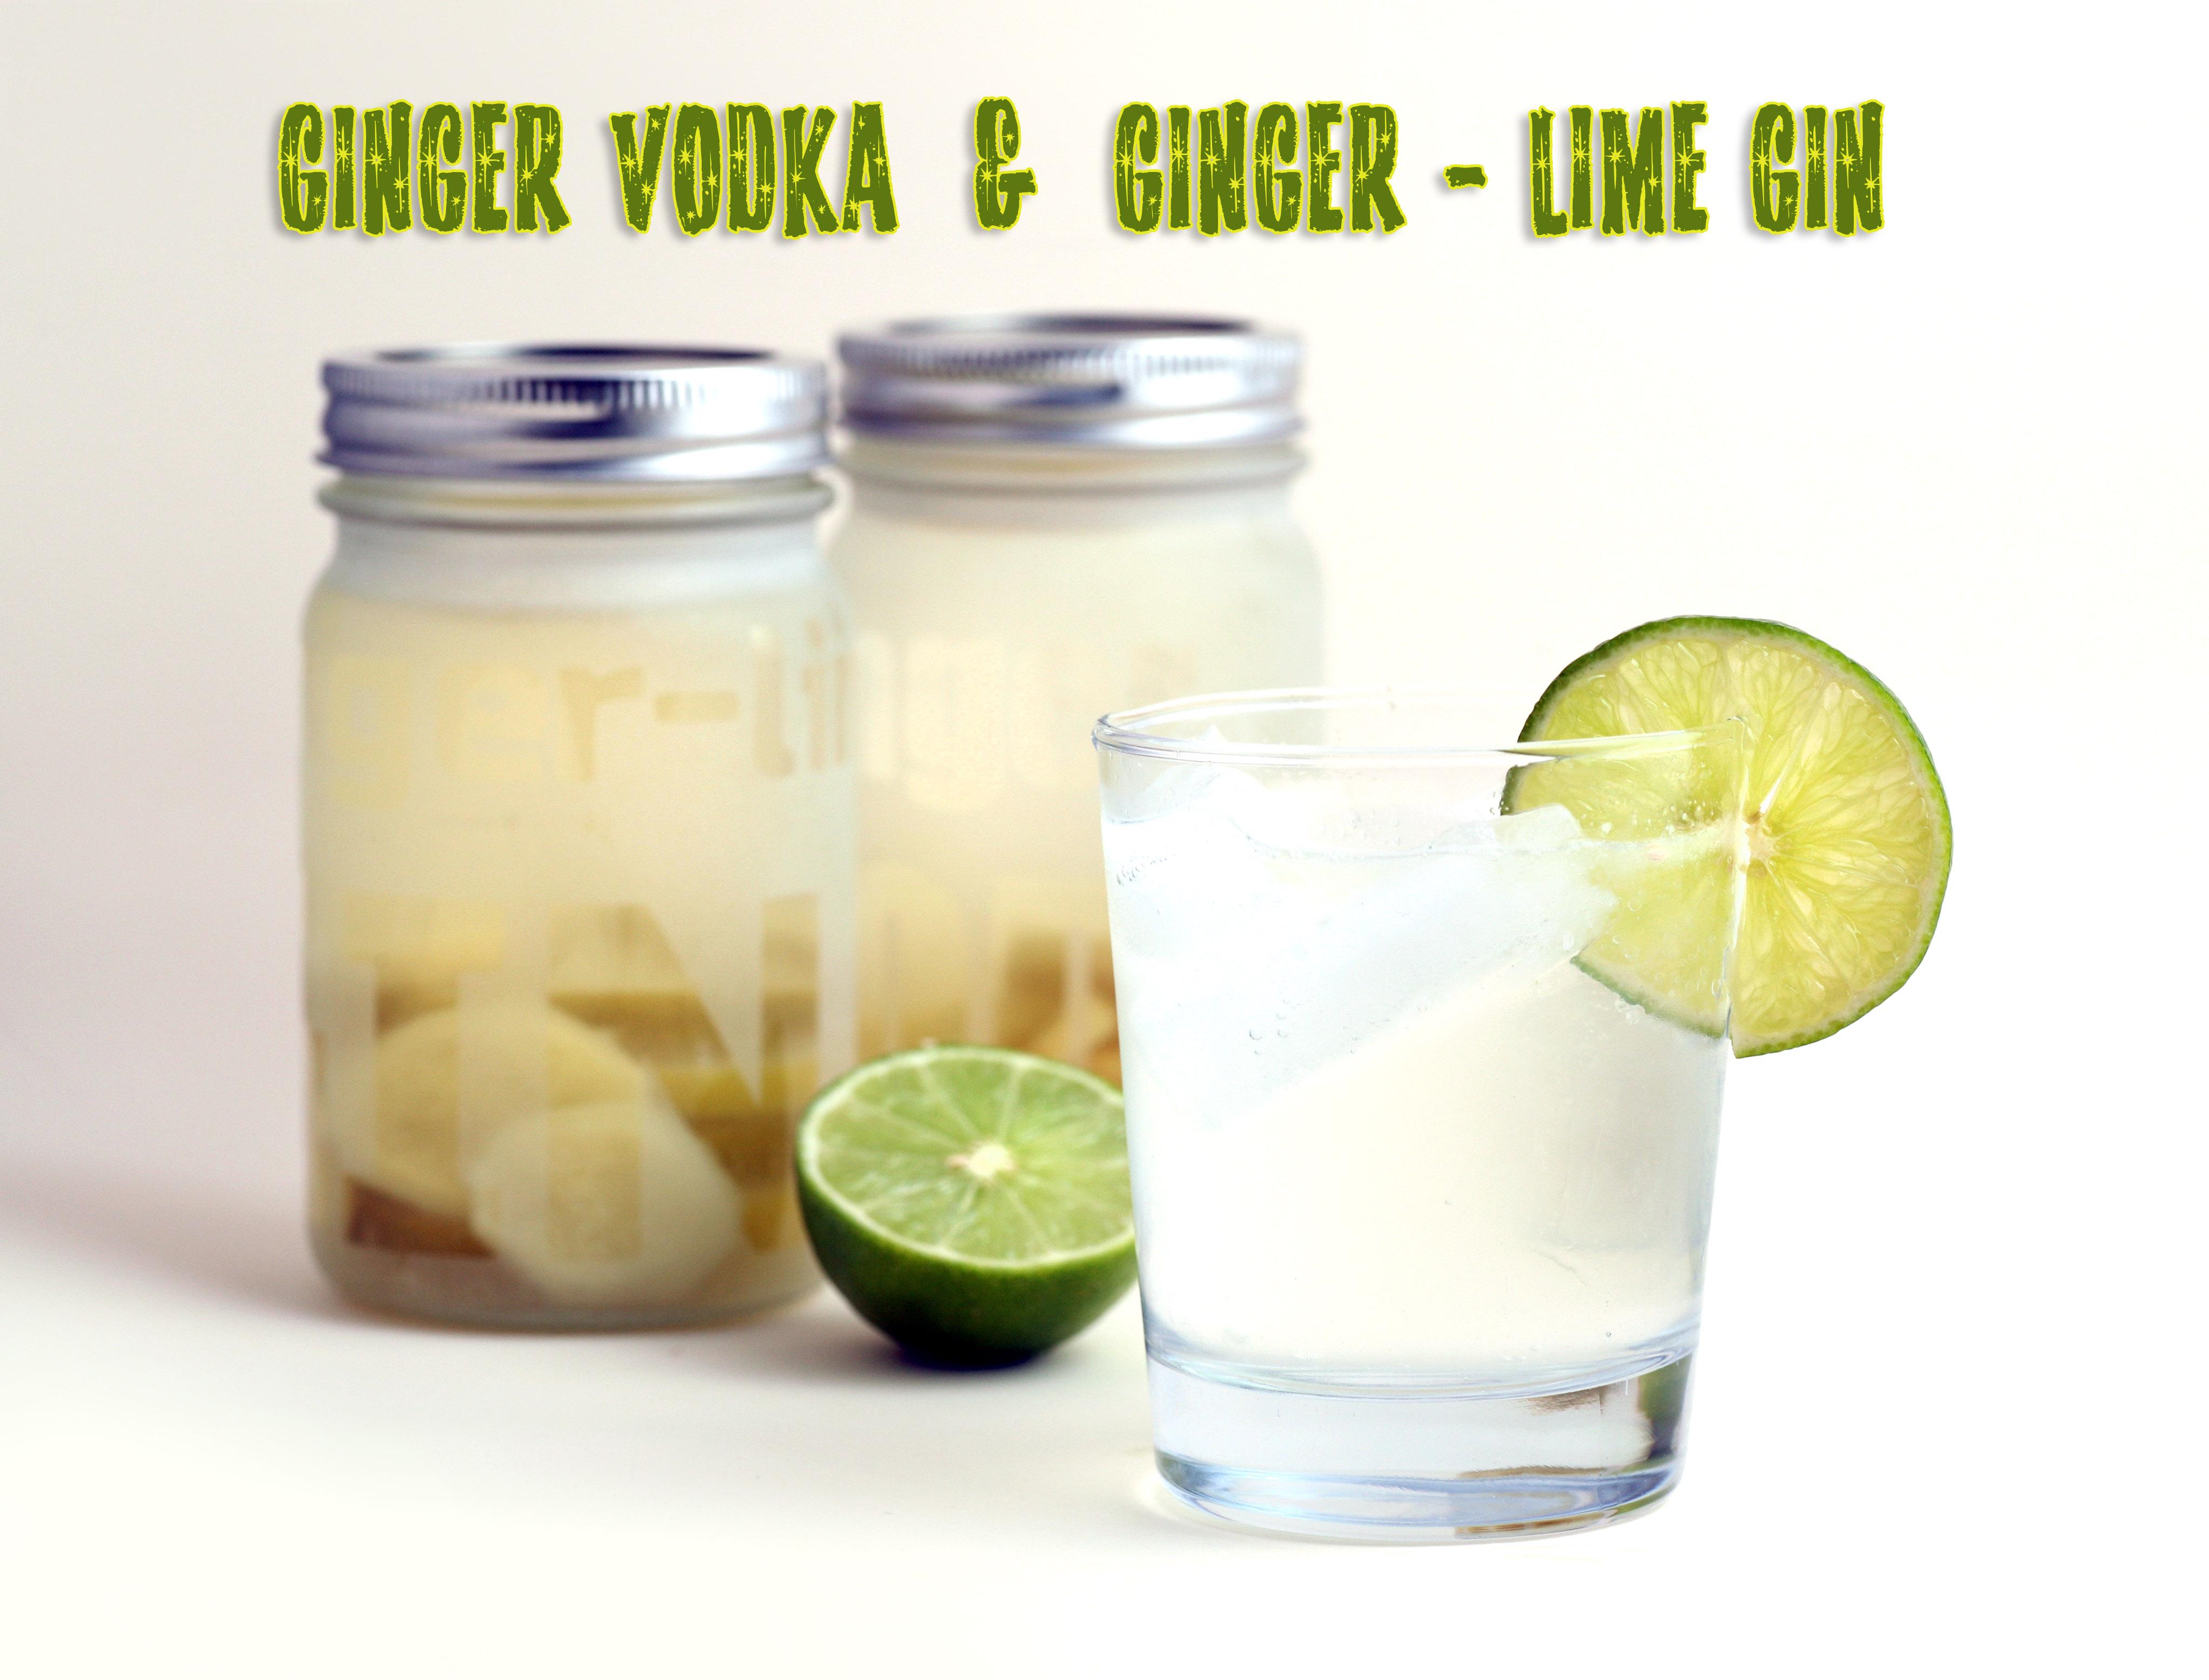 Ginger Vodka in Etched Glass Gift Jars